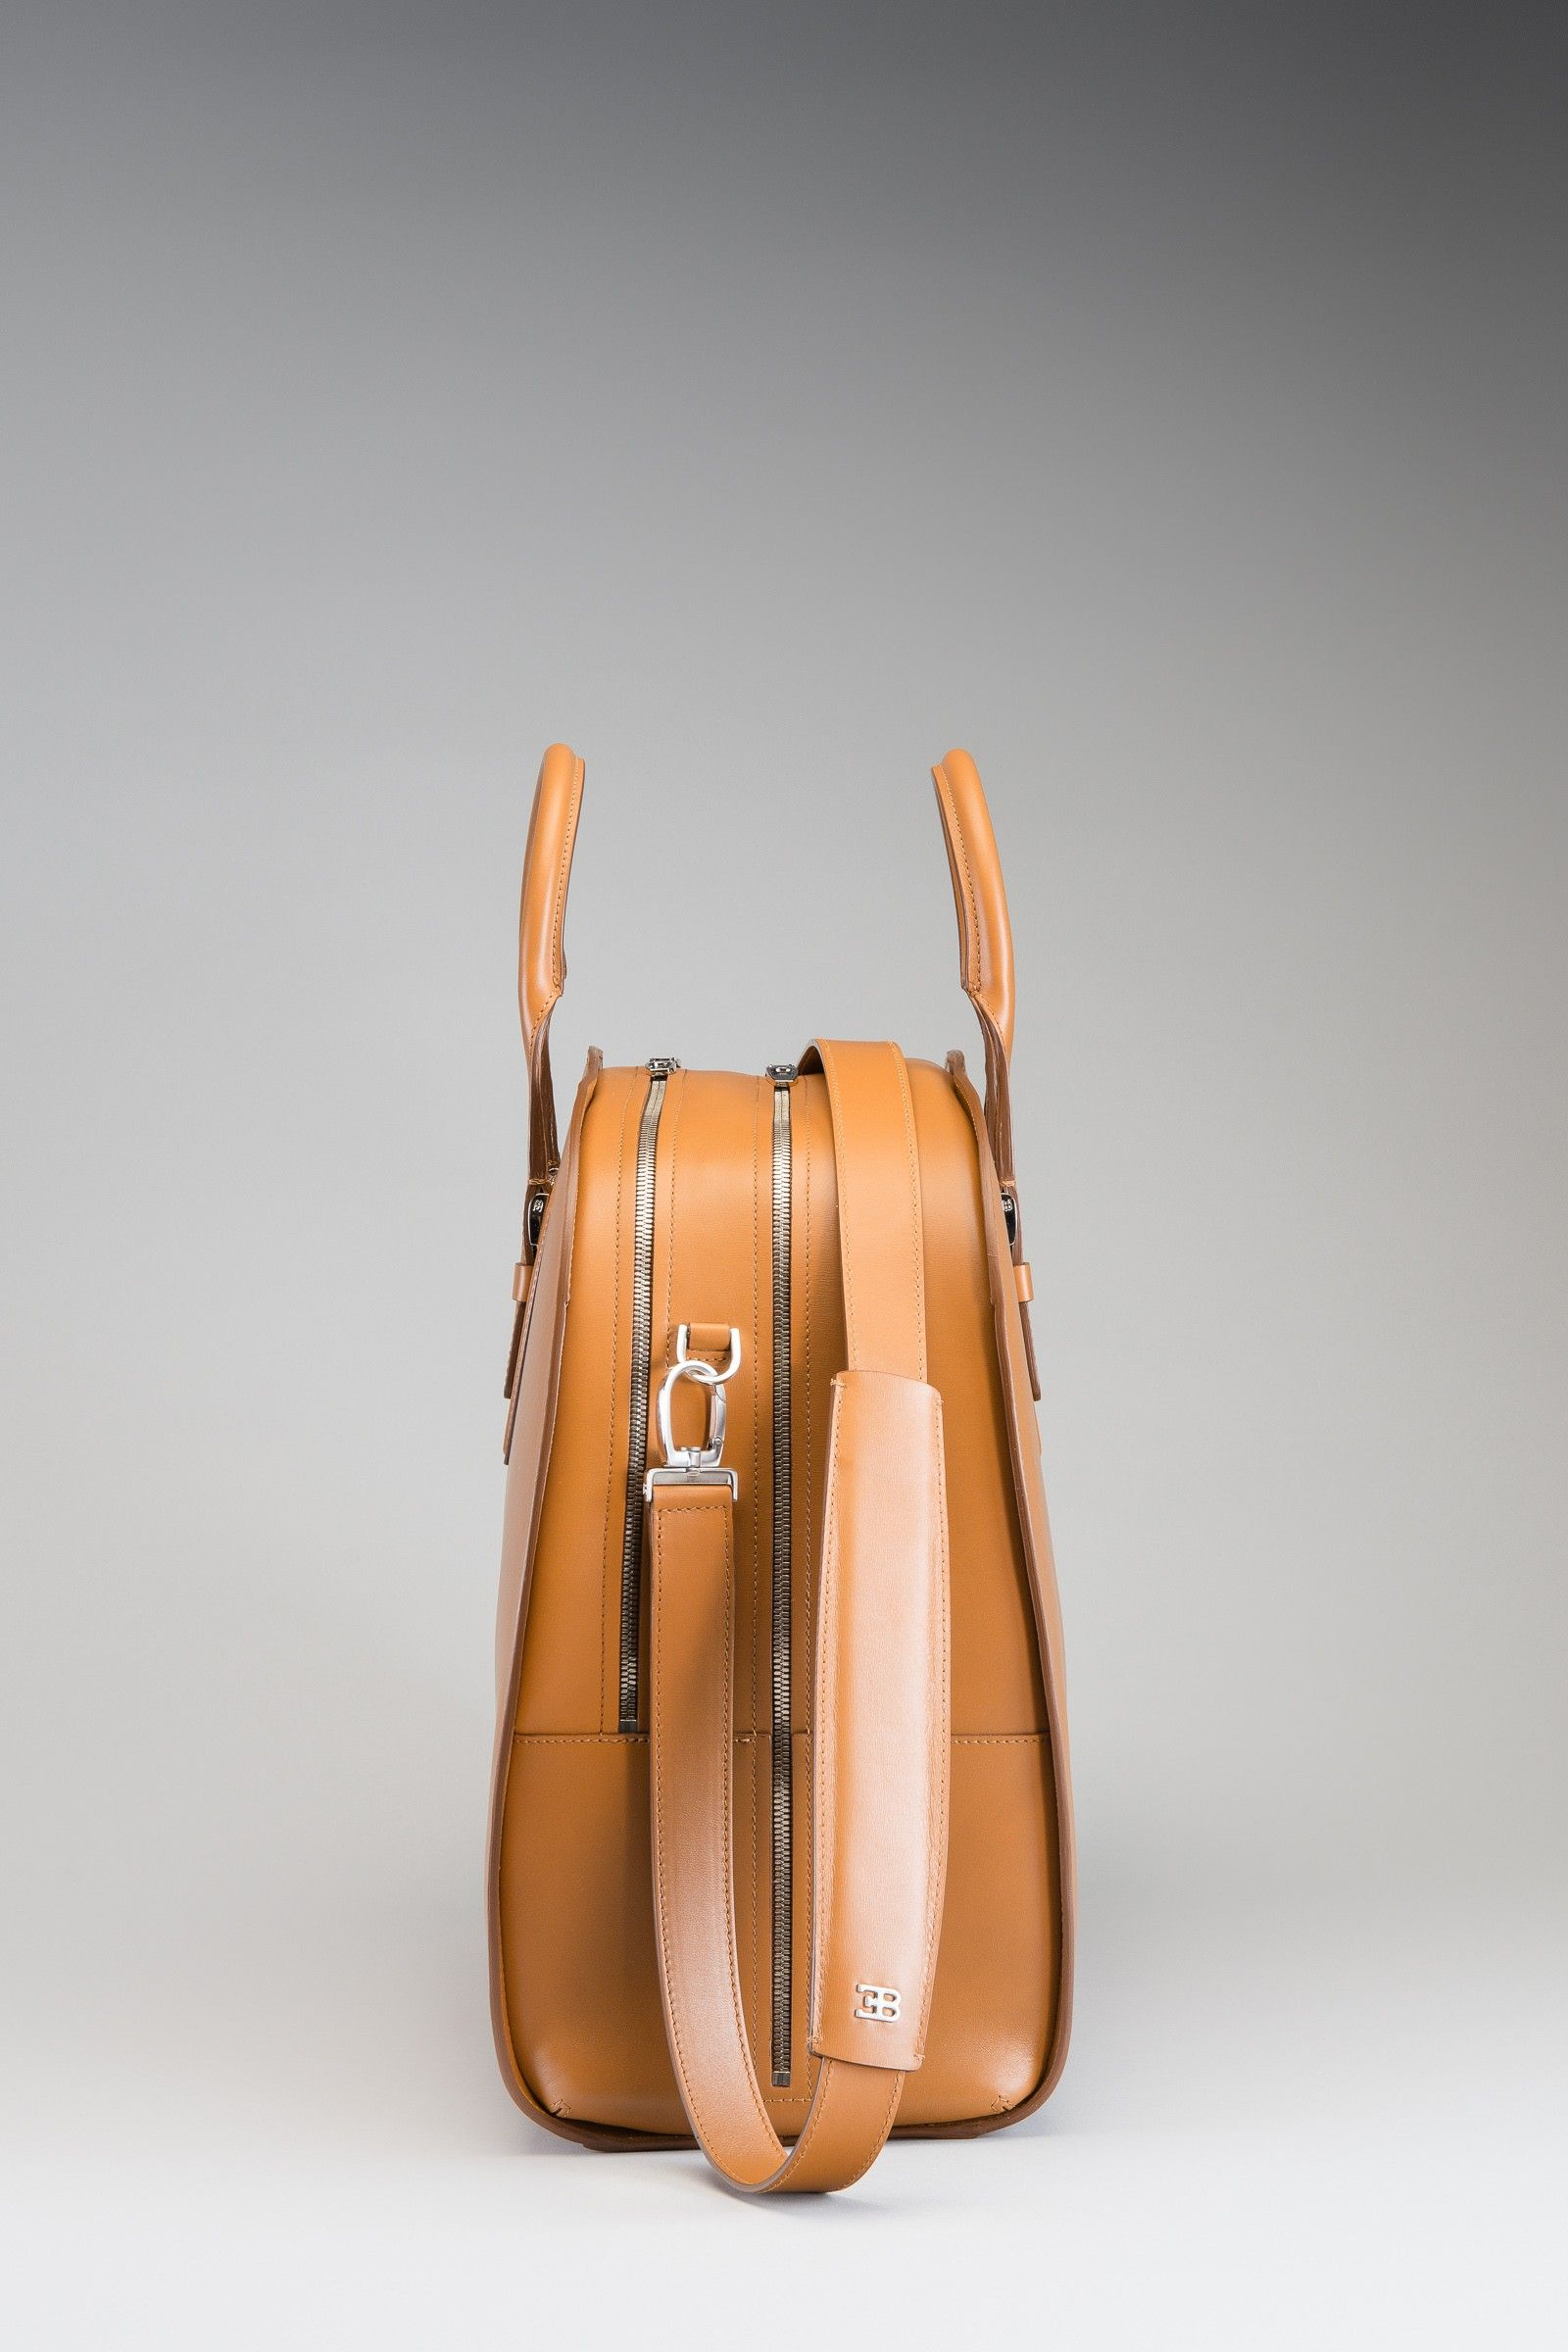 Bugatti Bag Large Bugatti Bag Bags Large Bags